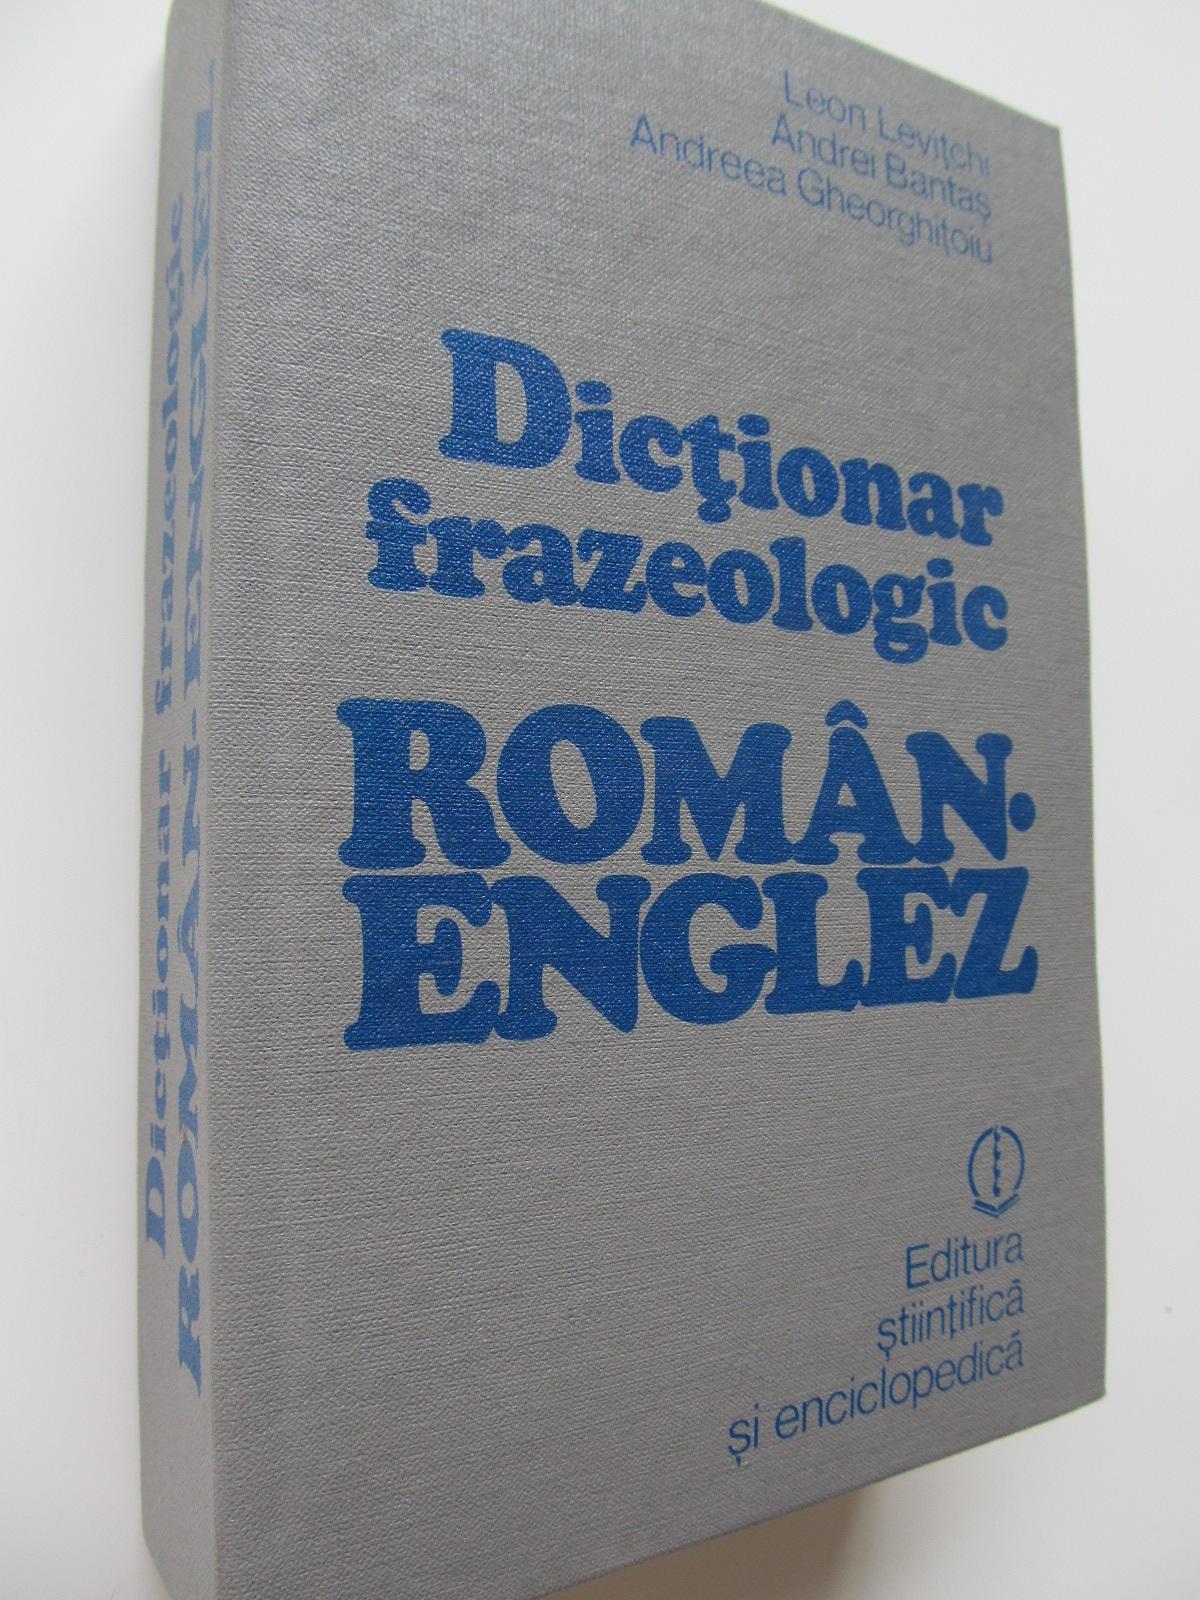 Dictionar frazeologic Roman Englez - Leon Levitchi , Andrei Bantas , Andreea Gheorghitoiu | Detalii carte